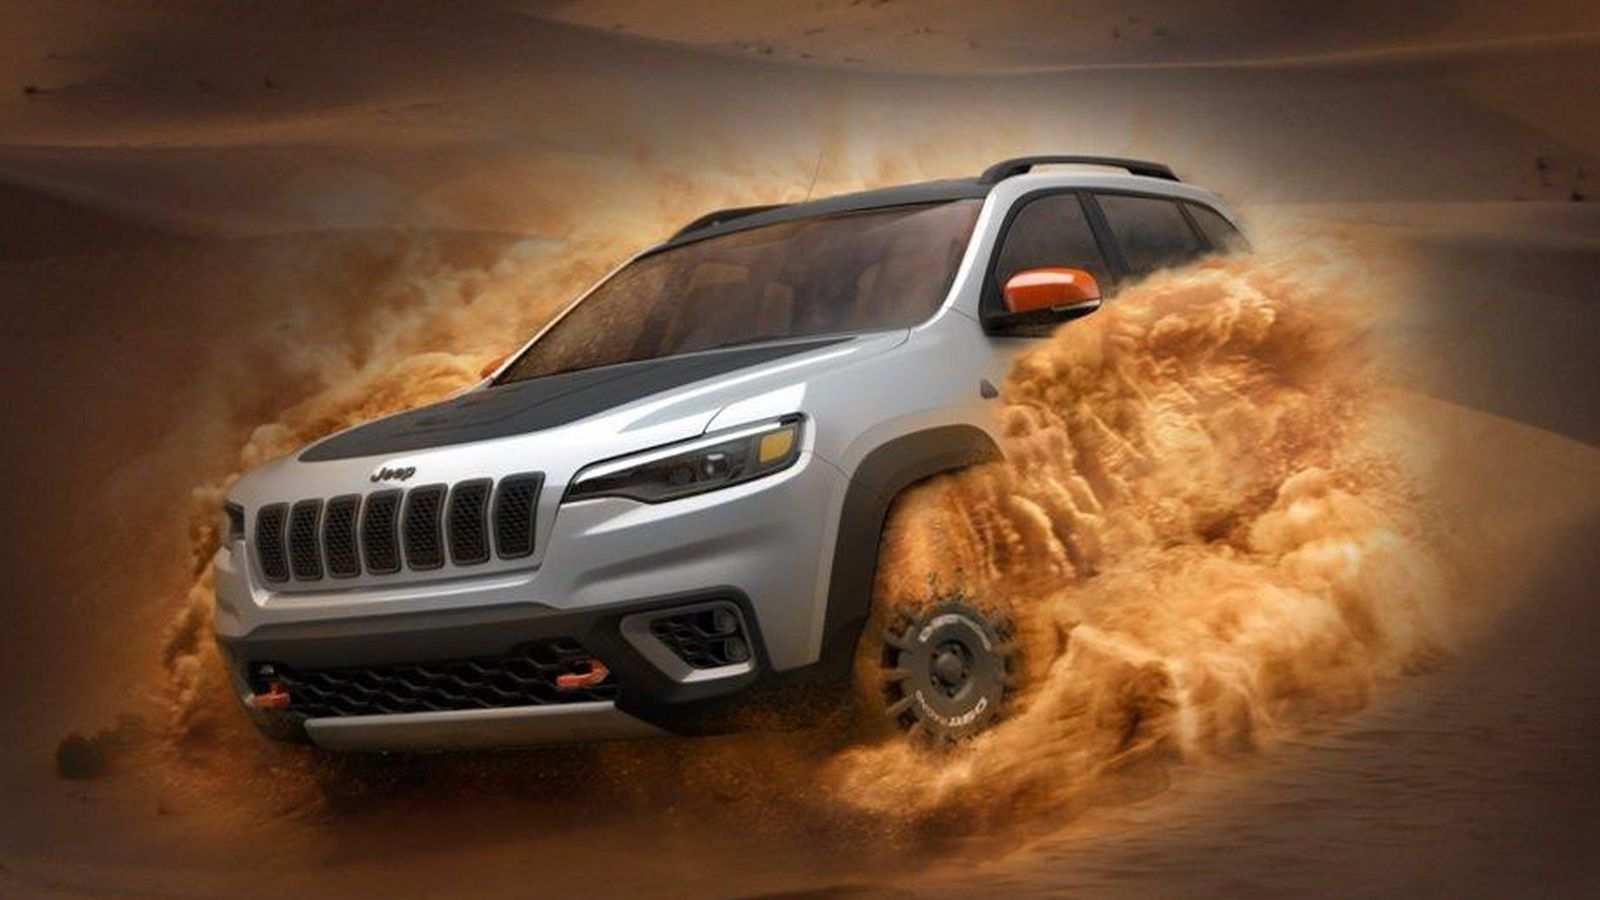 56 New Jeep Trailhawk 2020 Price by Jeep Trailhawk 2020